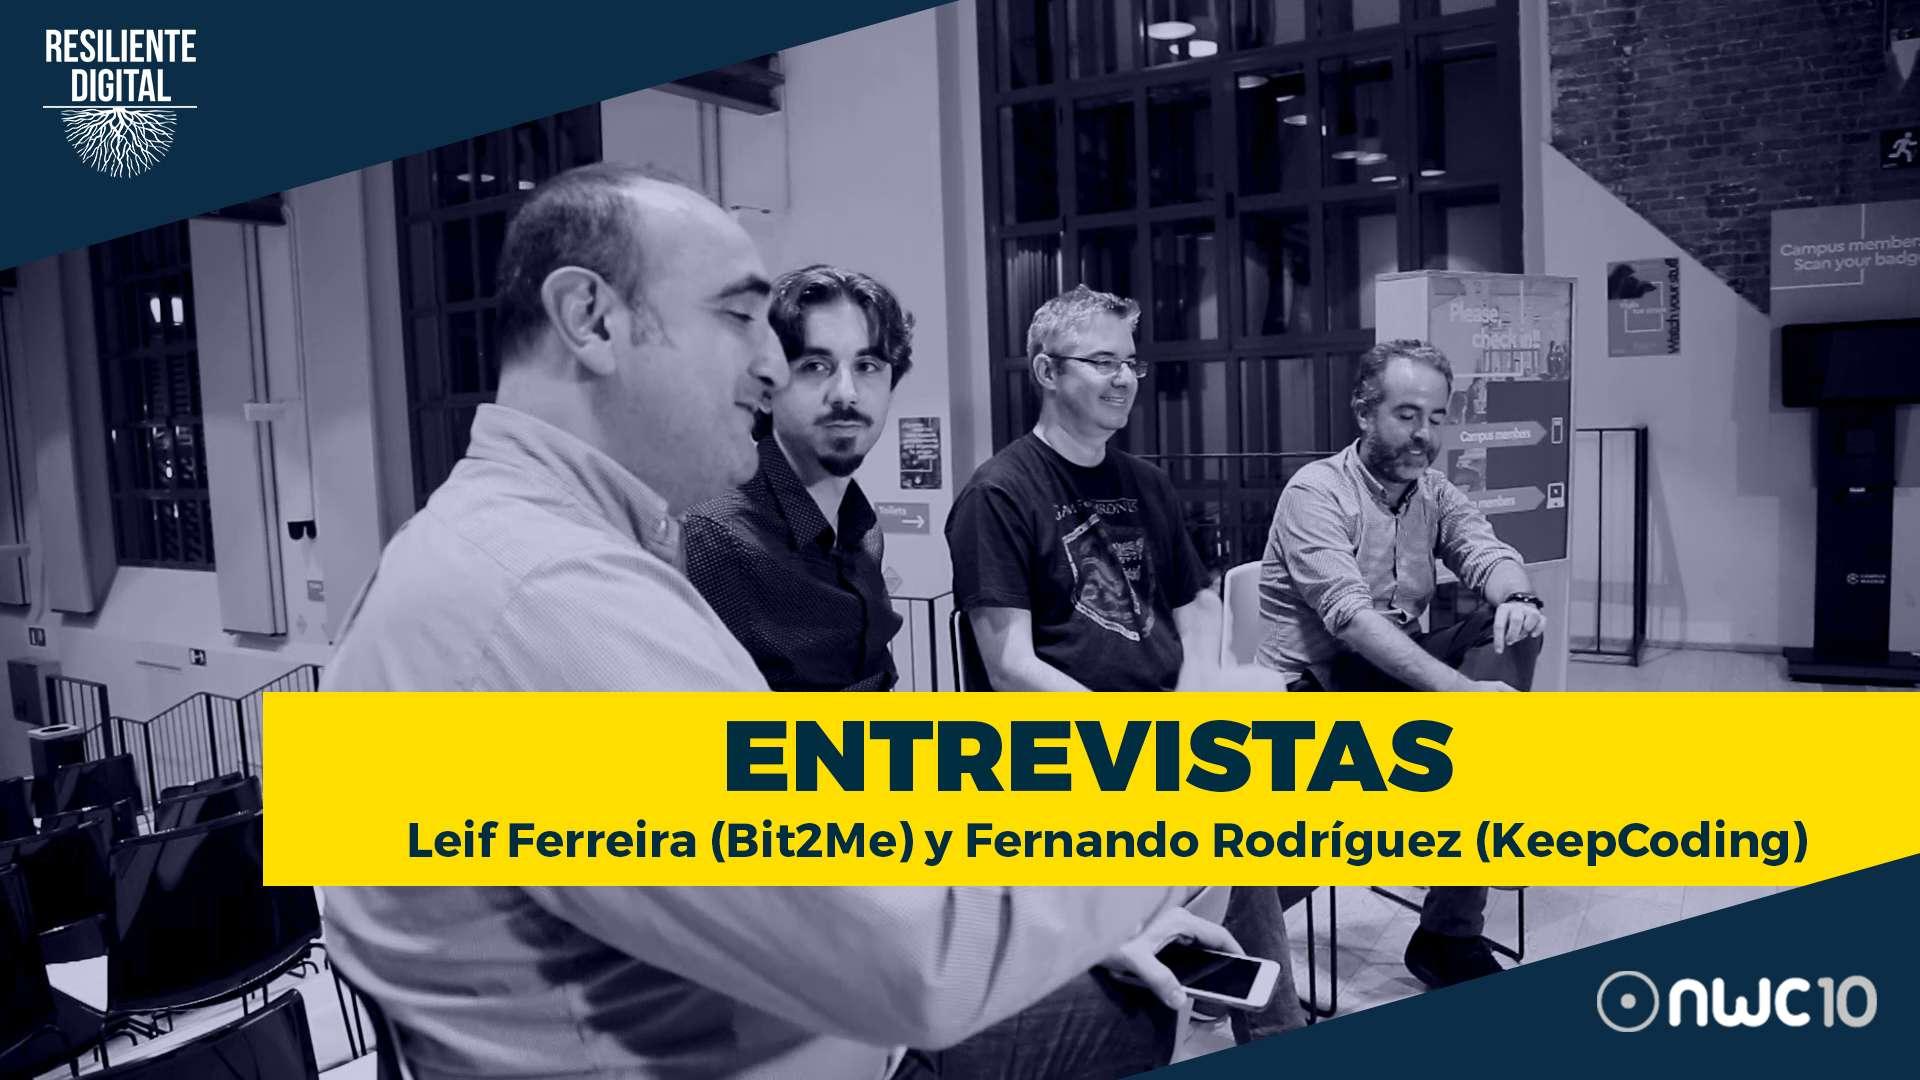 Entrevista a Leif Ferreira de Bit2Me y Fernando Rodríguez de KeepCoding